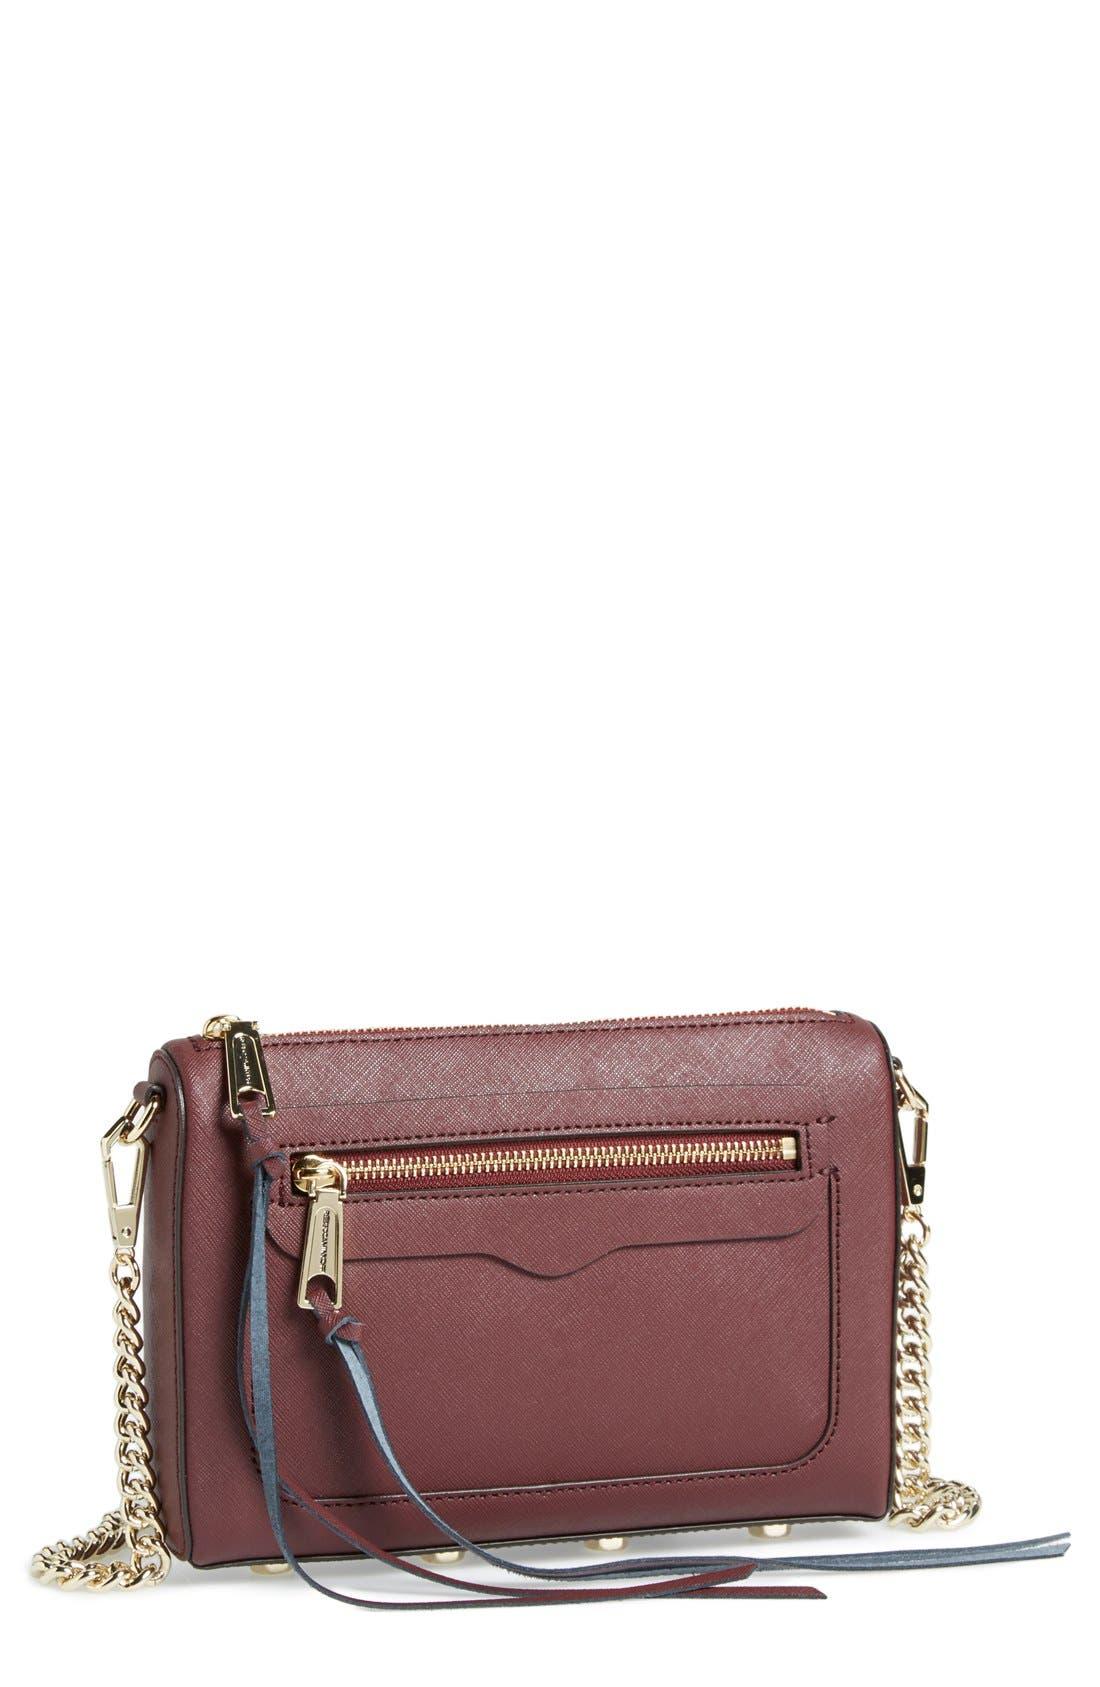 Main Image - Rebecca Minkoff 'Avery' Convertible Crossbody Bag